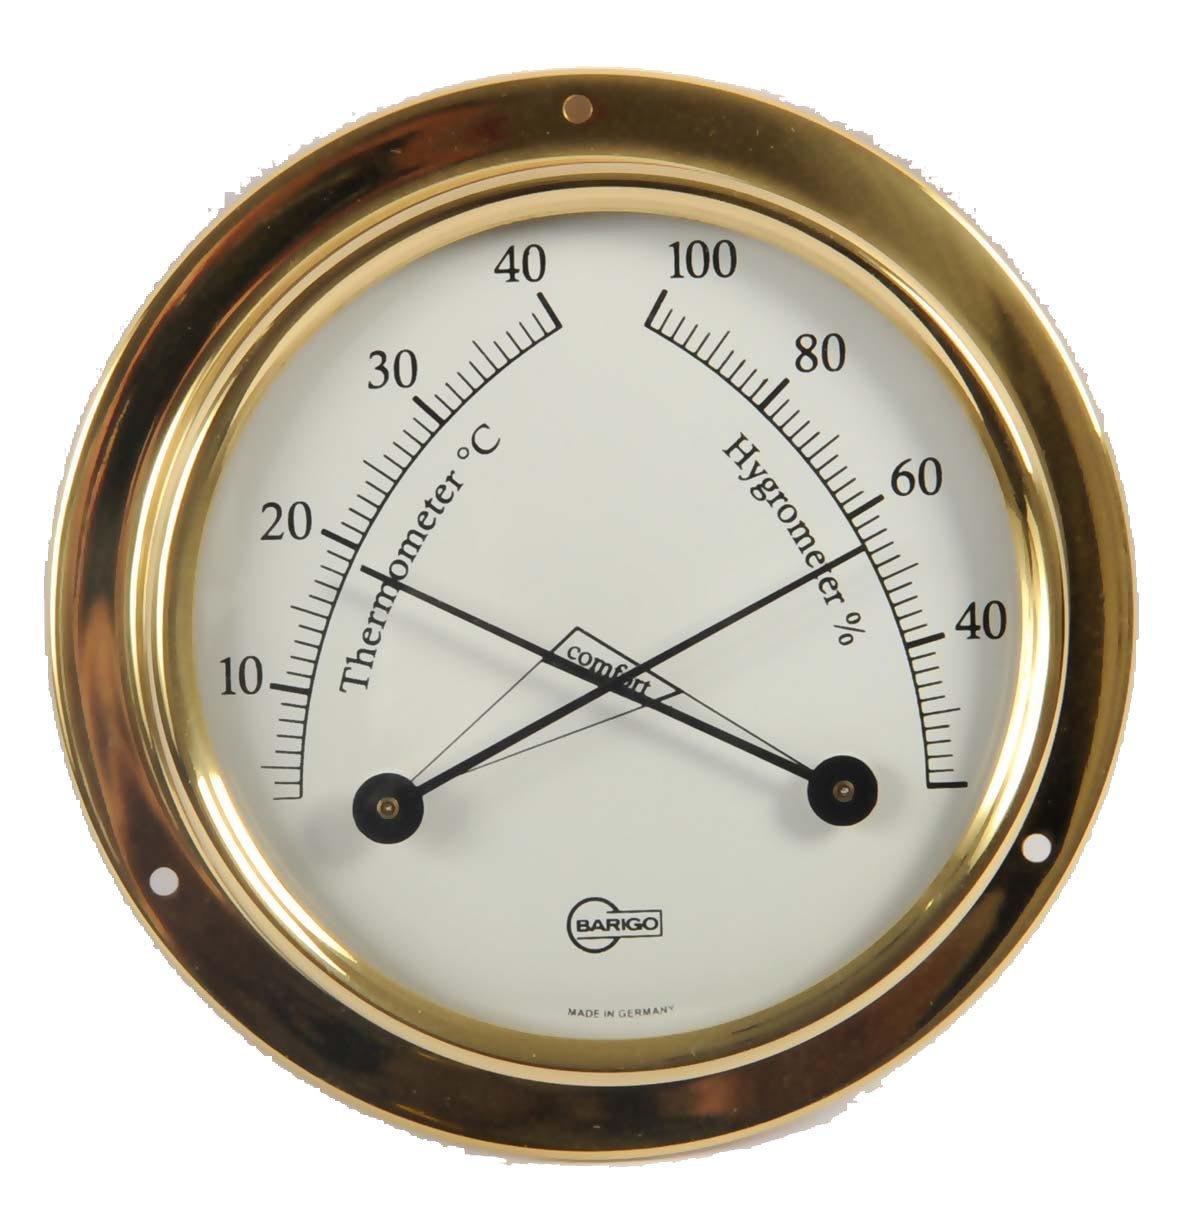 BARIGO Tempo S Polished Brass Hygrometer Thermometer 70mm